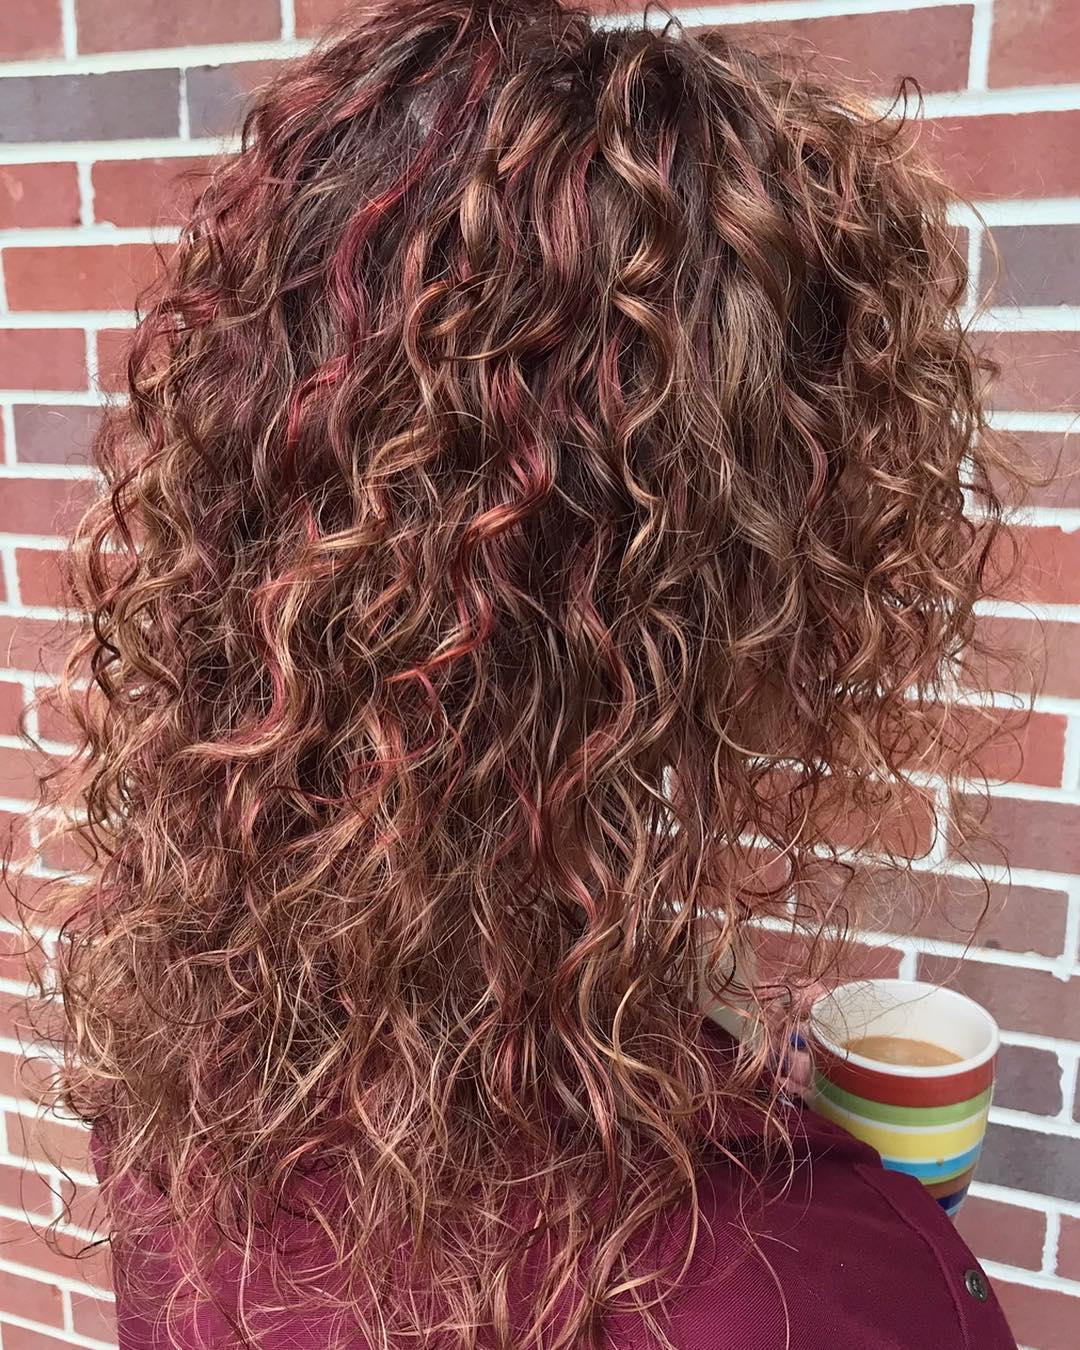 Curly Dark Auburn Hair Color With Lowlights